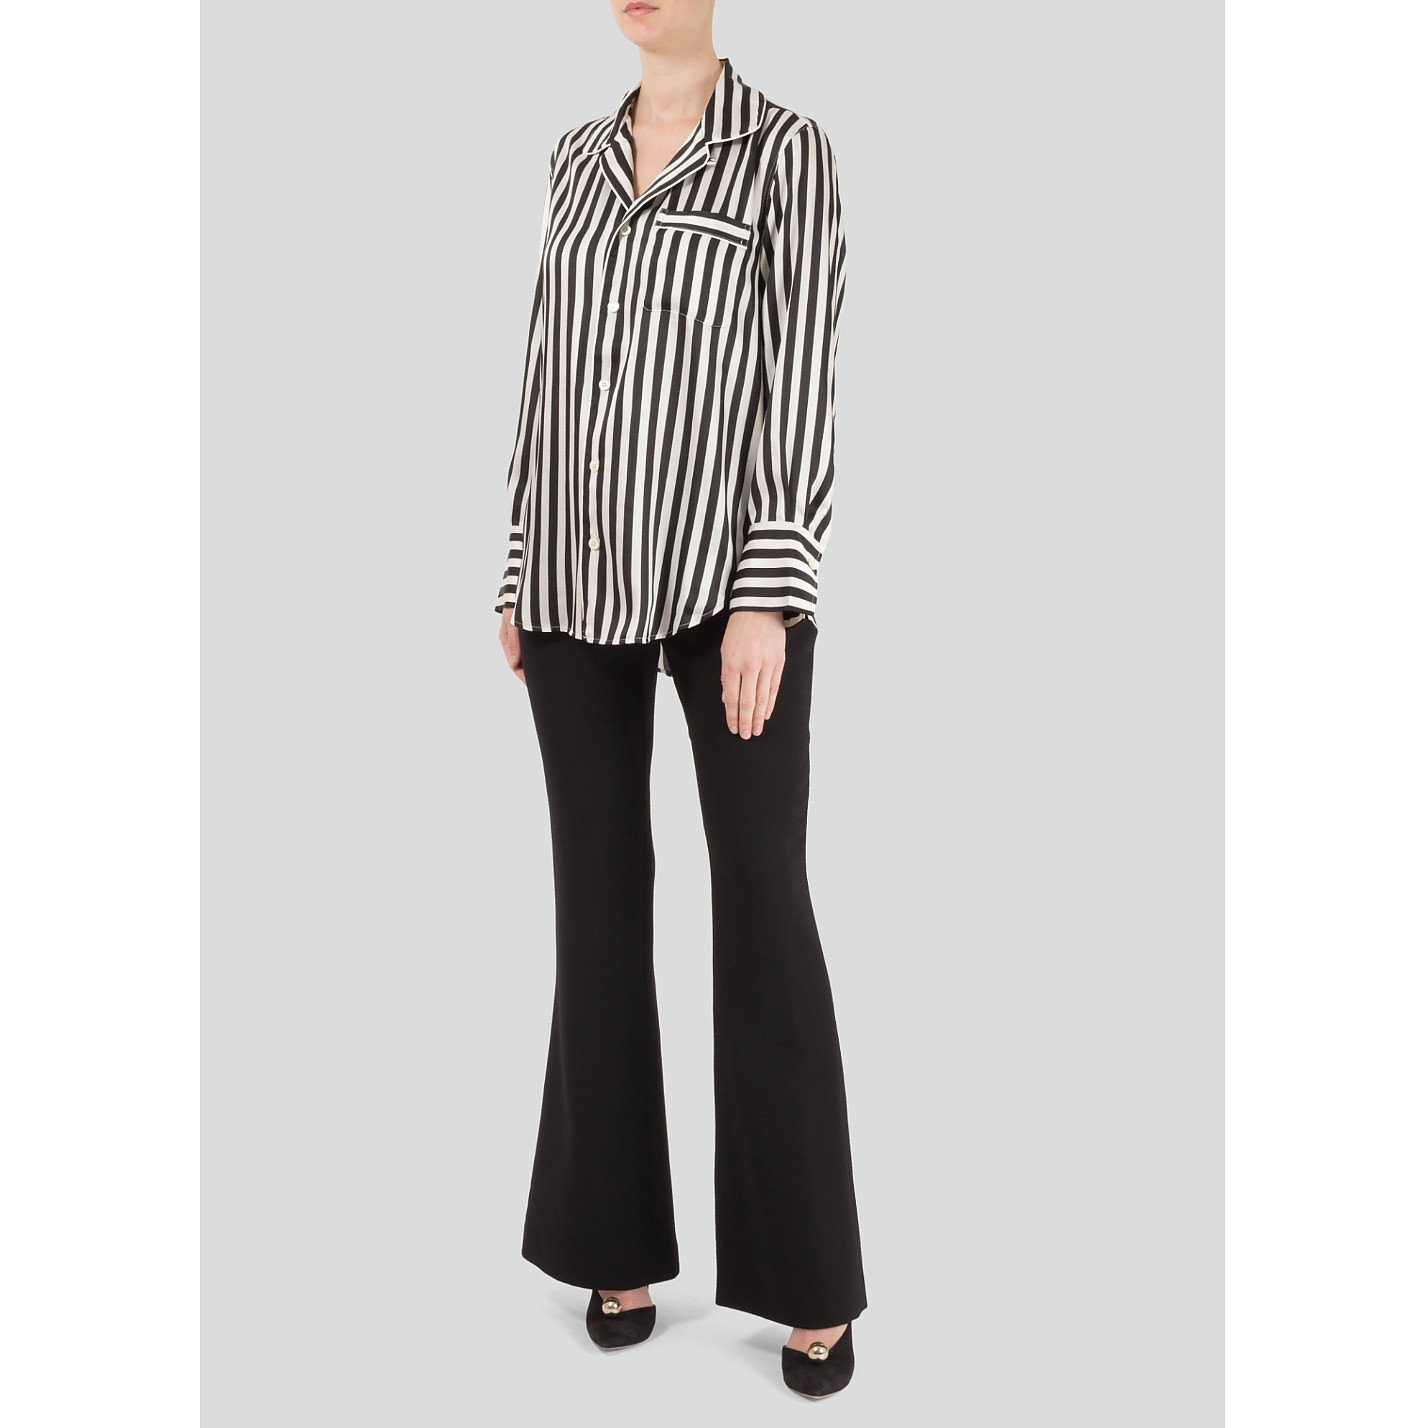 Polo Ralph Lauren Striped Pyjama Style Shirt